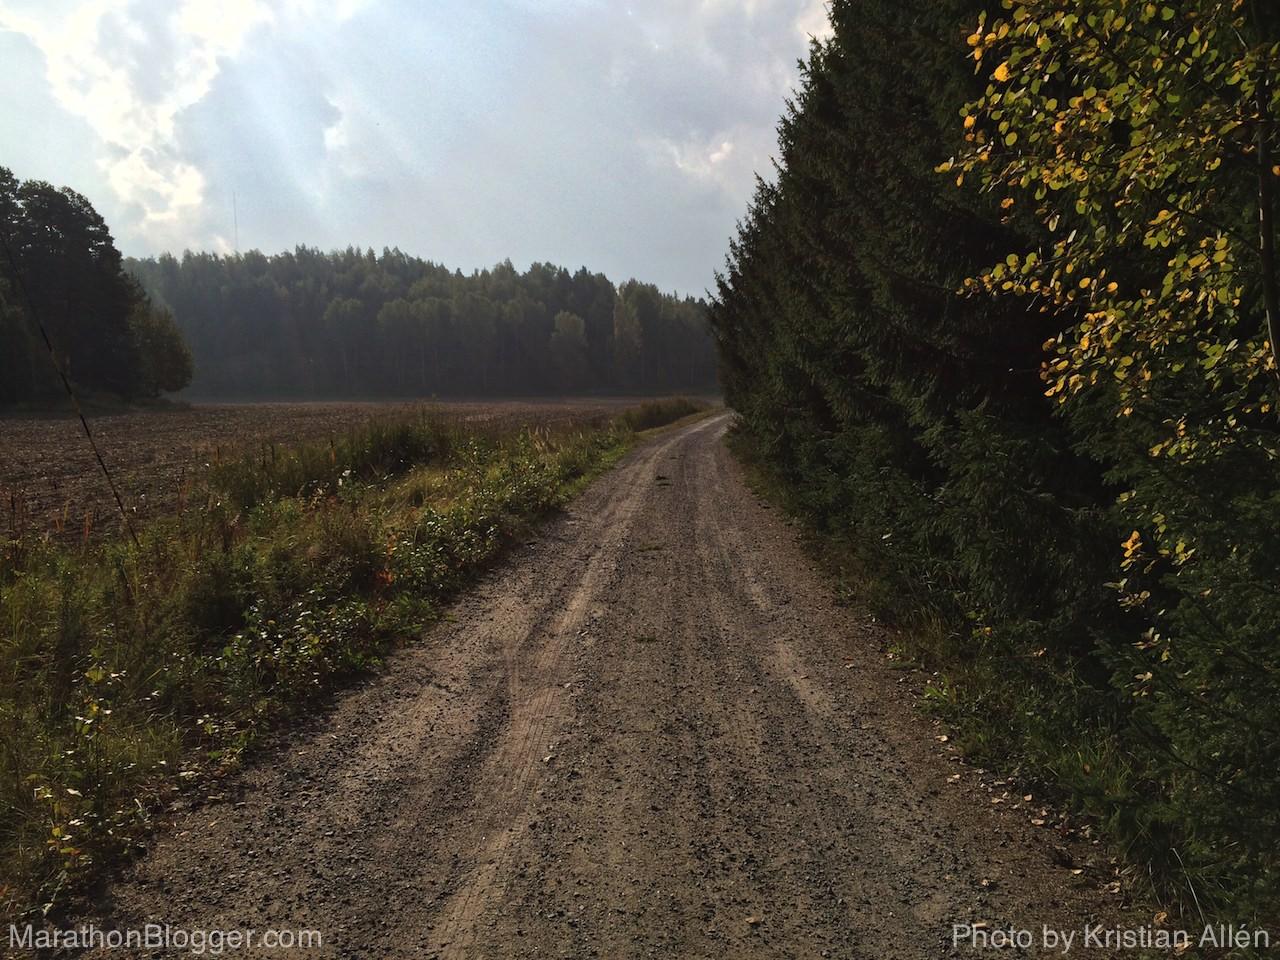 21.9.2014 10.18 km